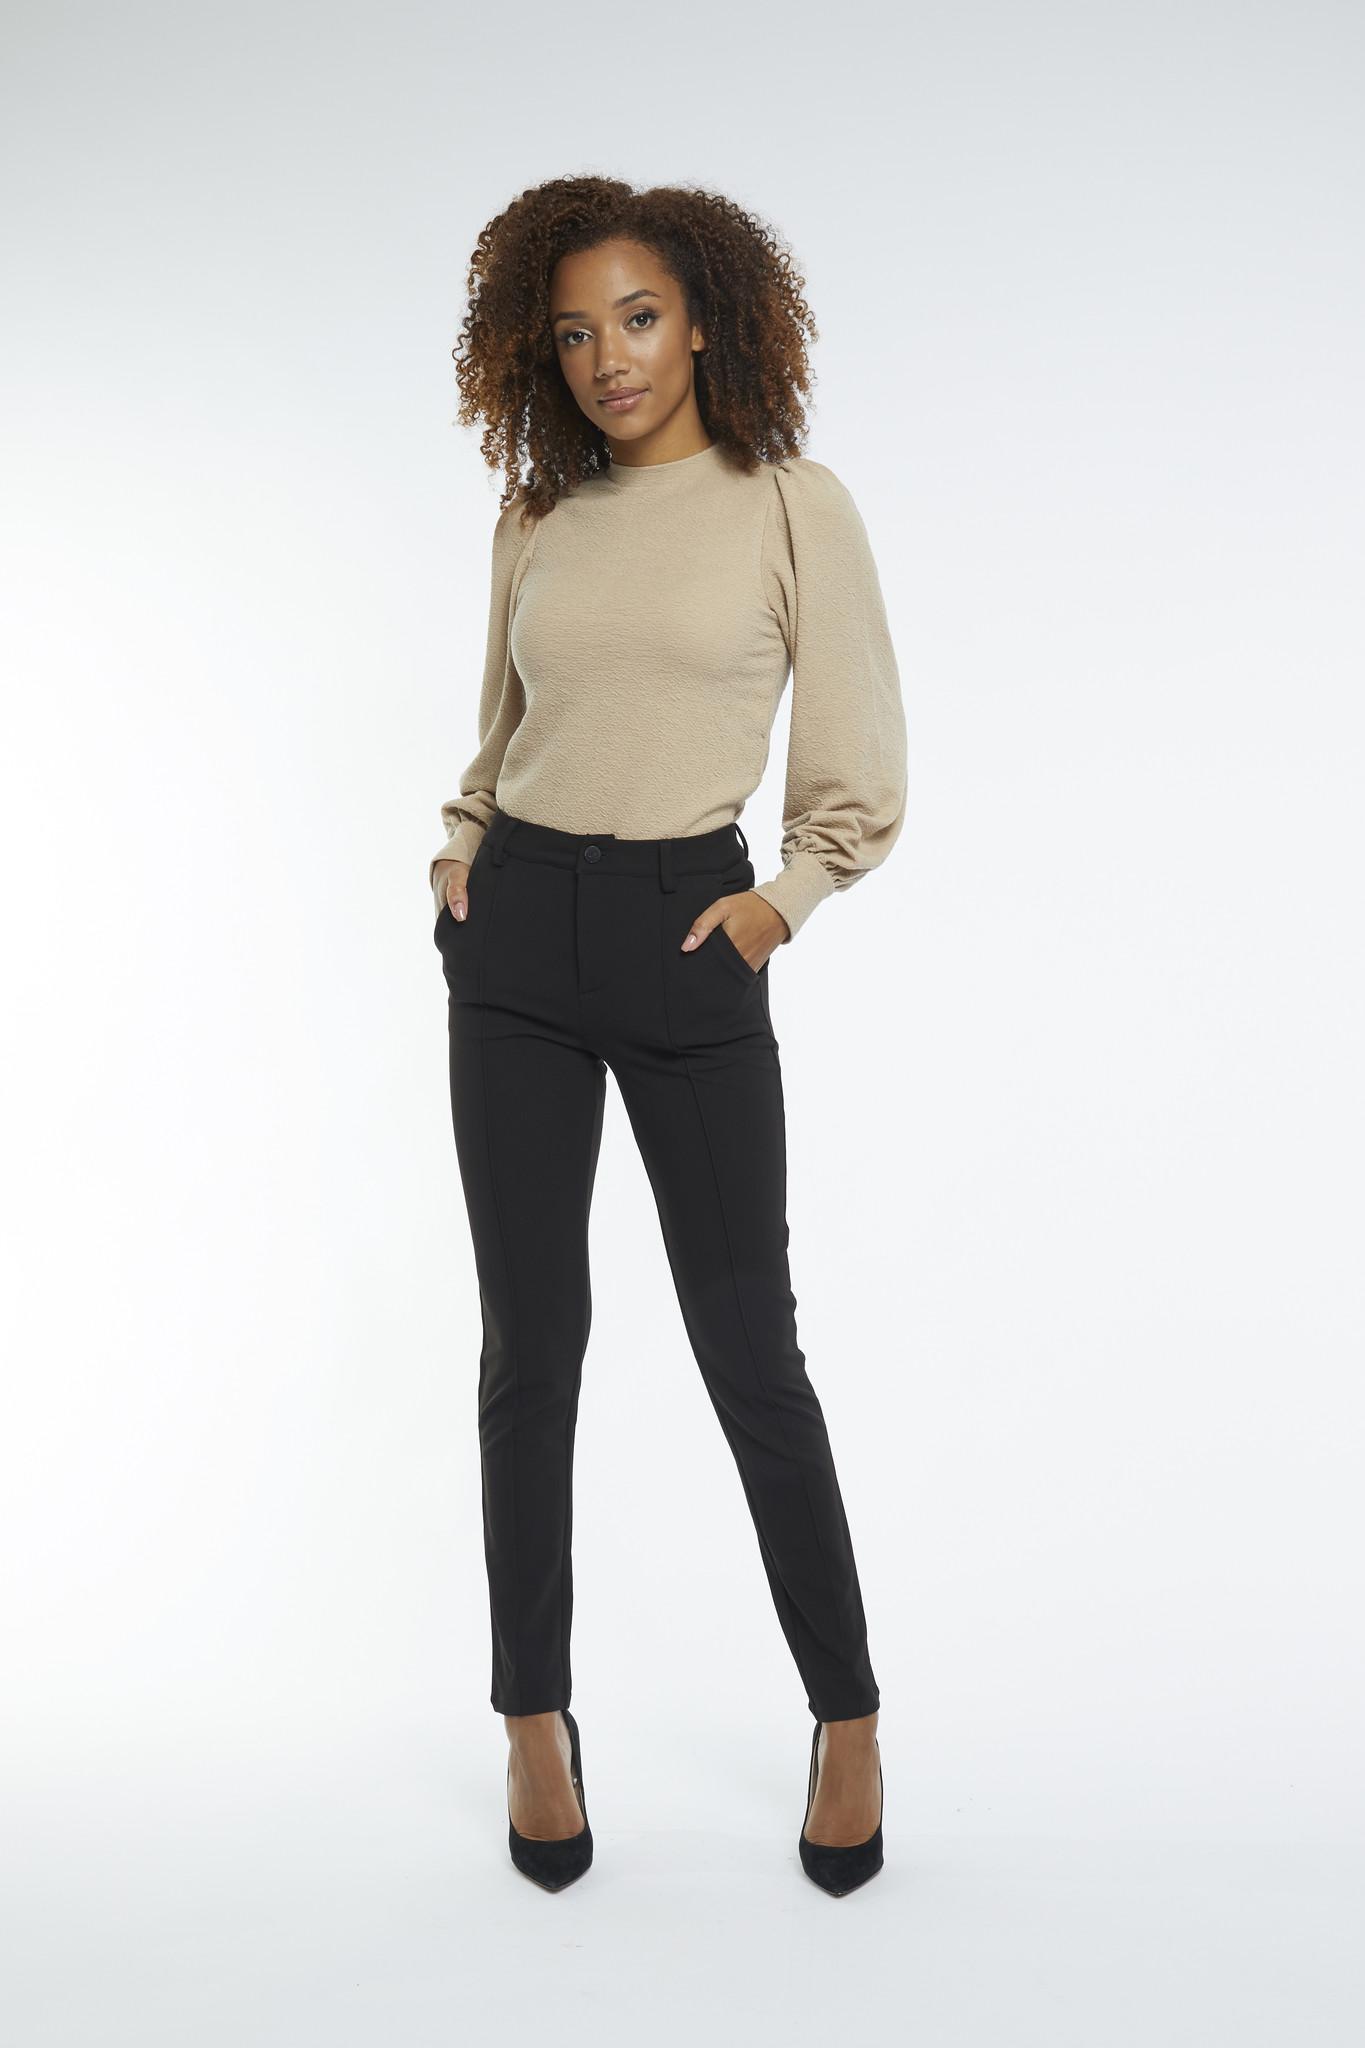 Lofty Manner Black Pants Chiara